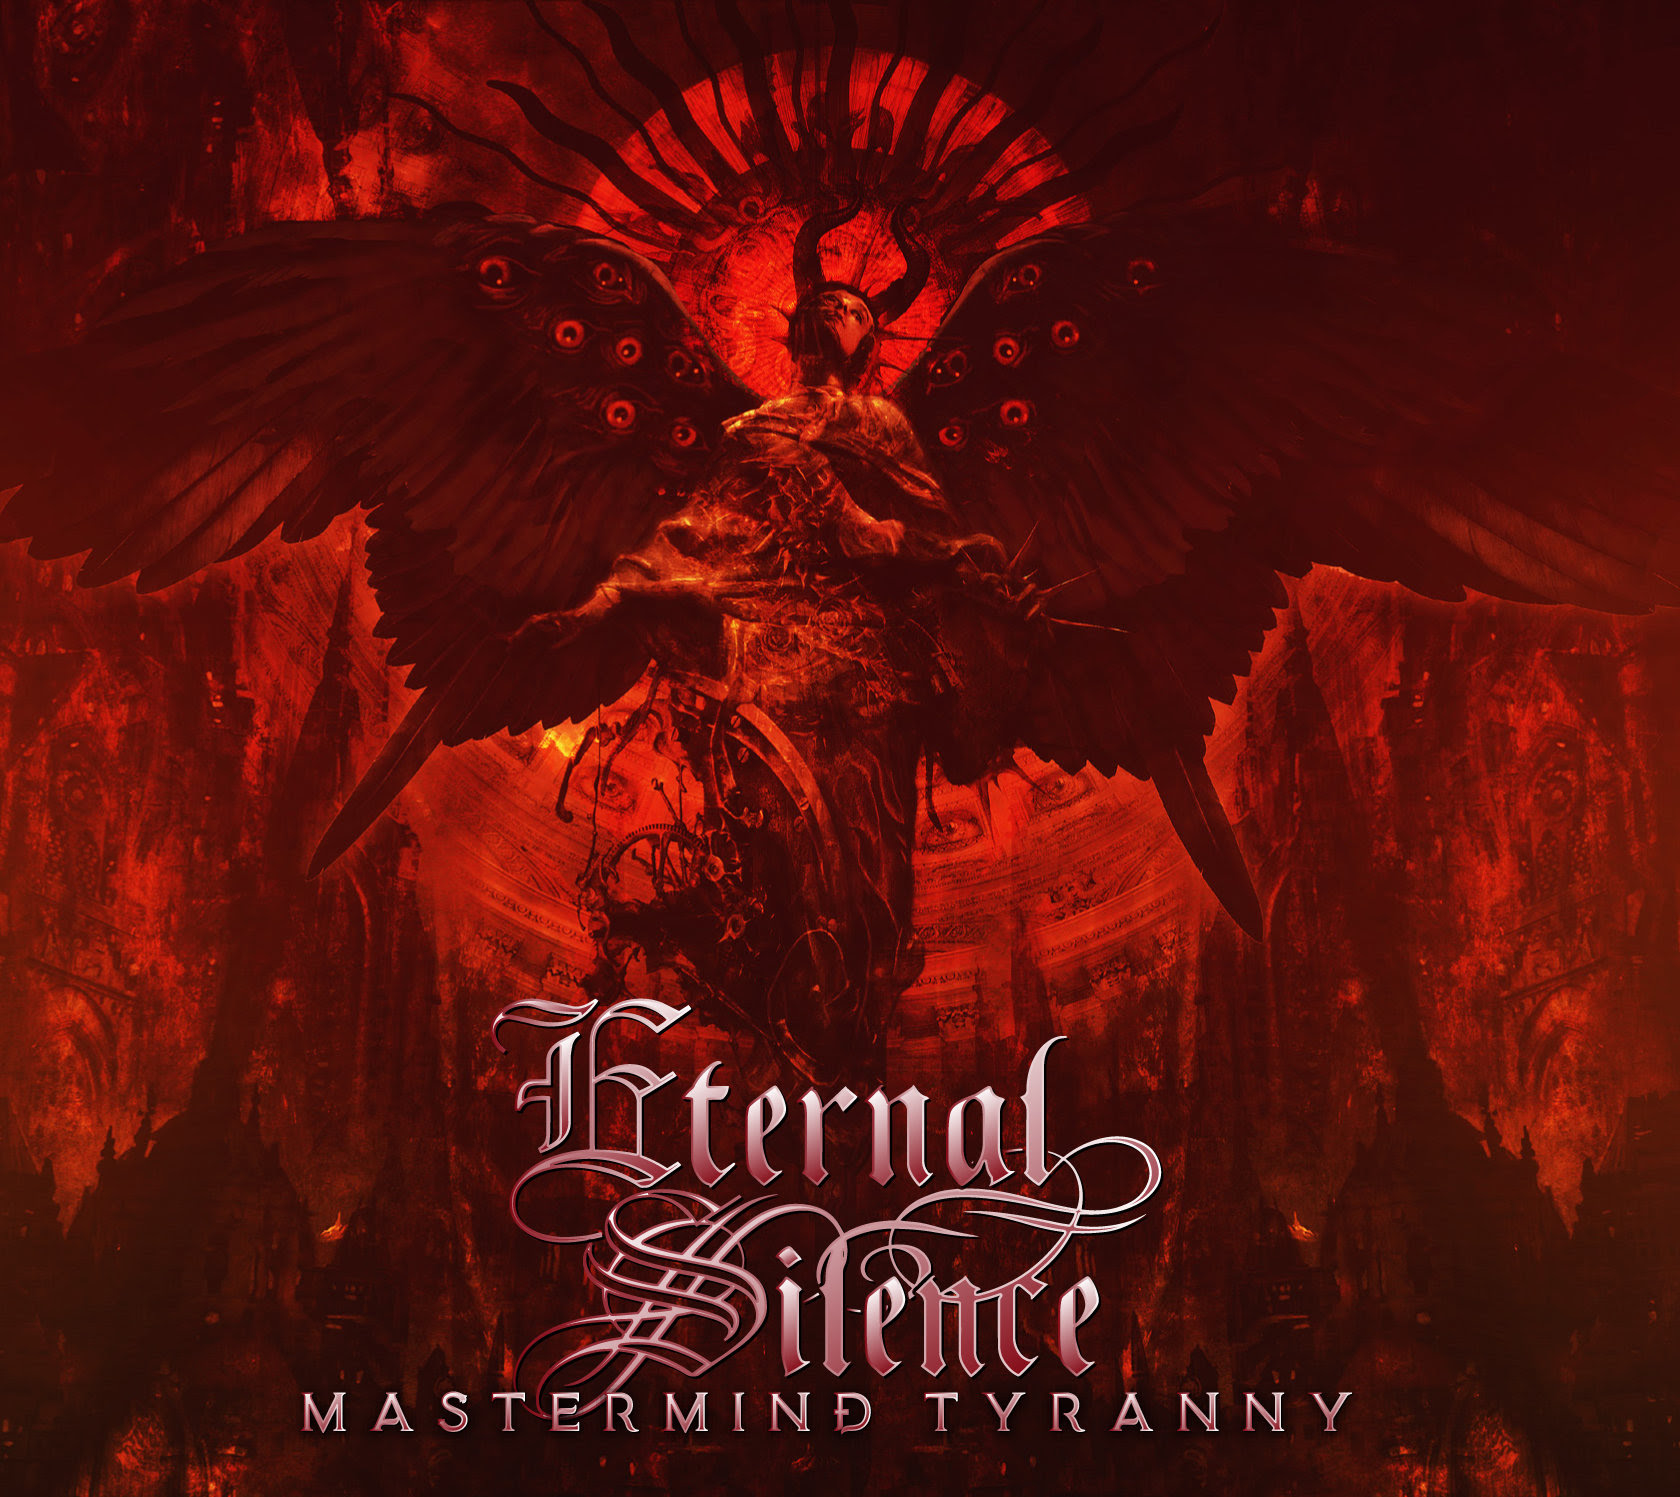 Recenze: Eternal Silence – Mastermind Tyranny